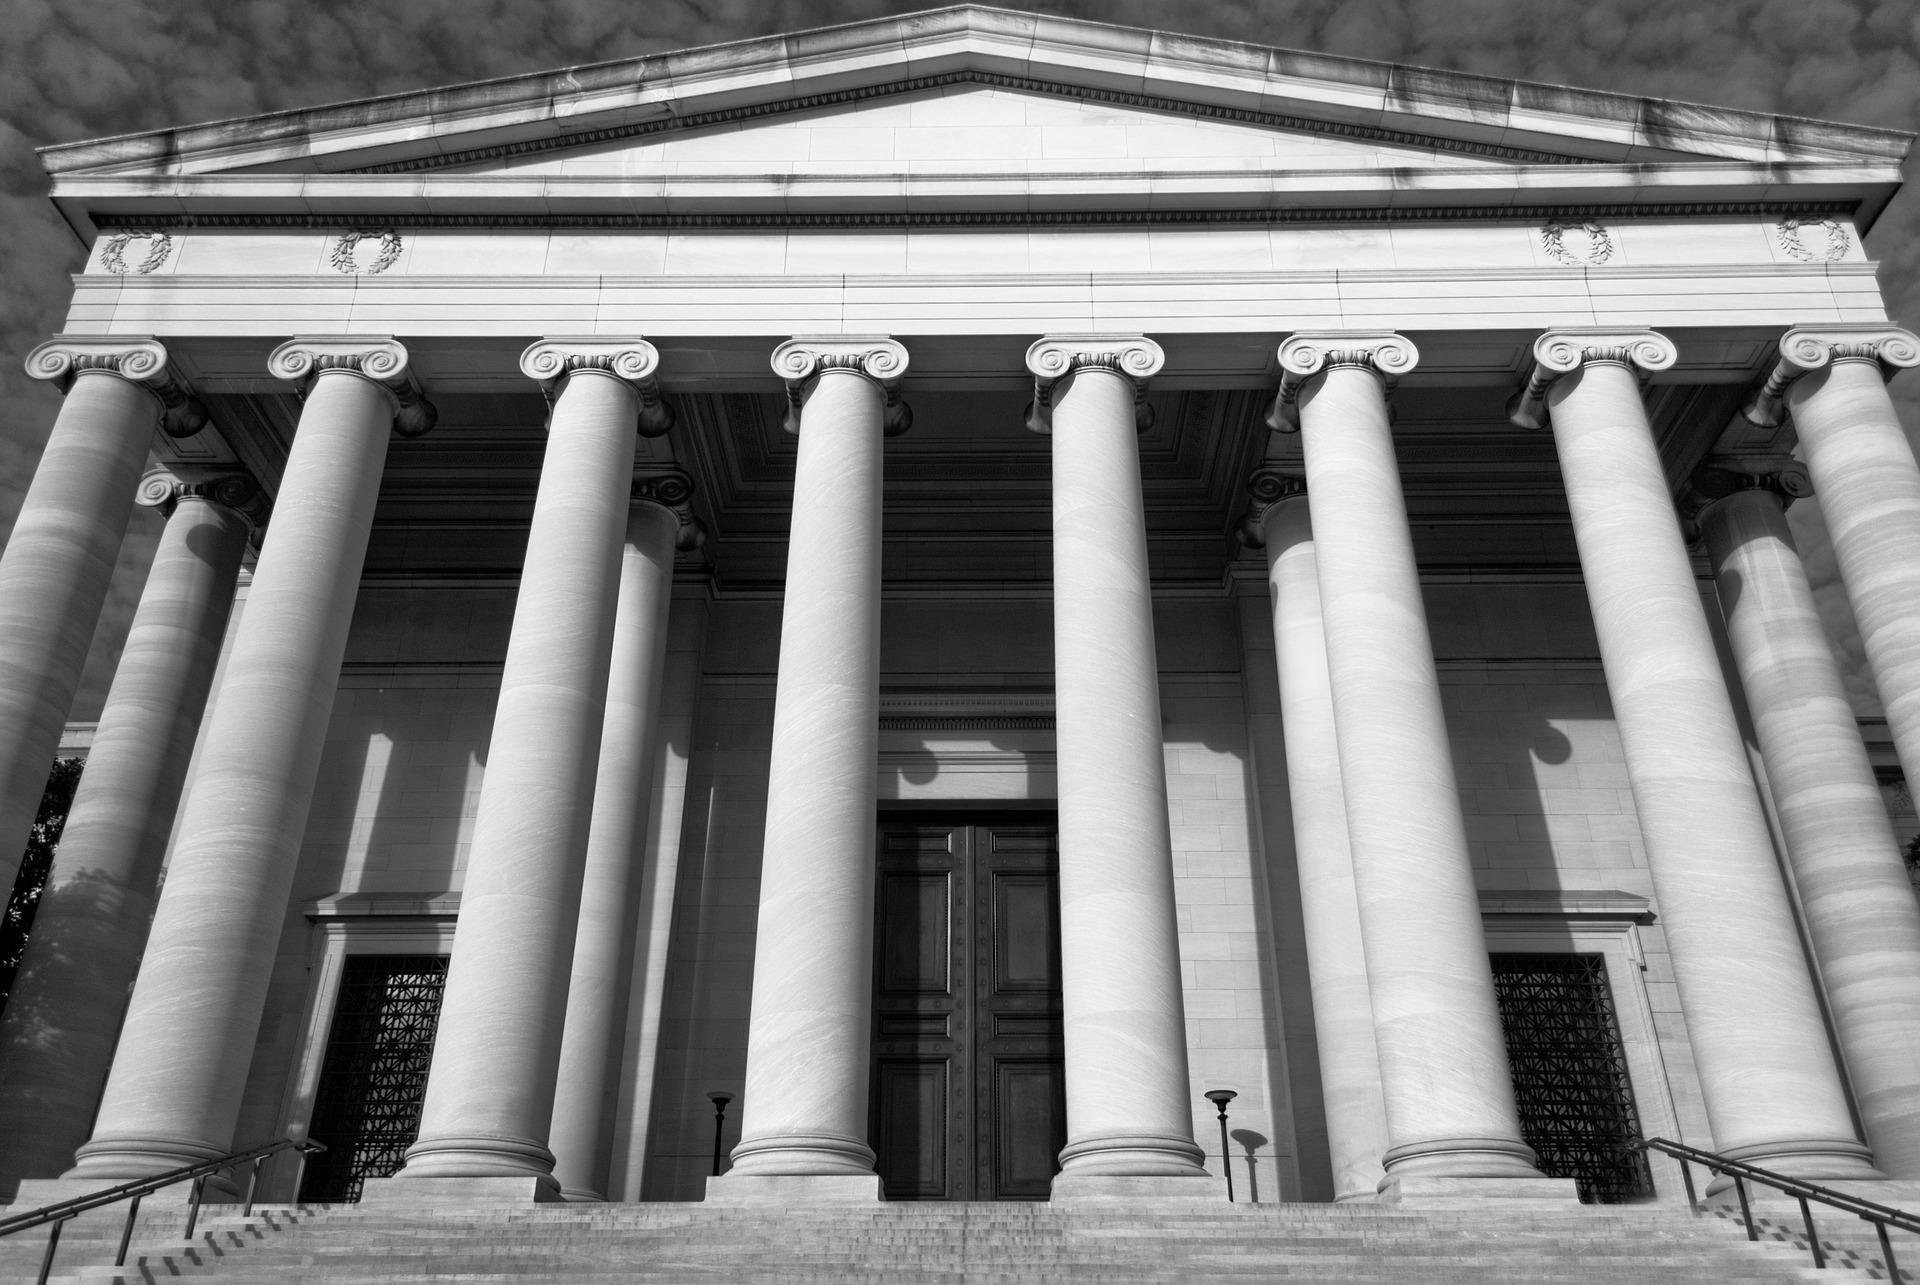 Multidistrict Litigation Category Archives — Page 6 of 8